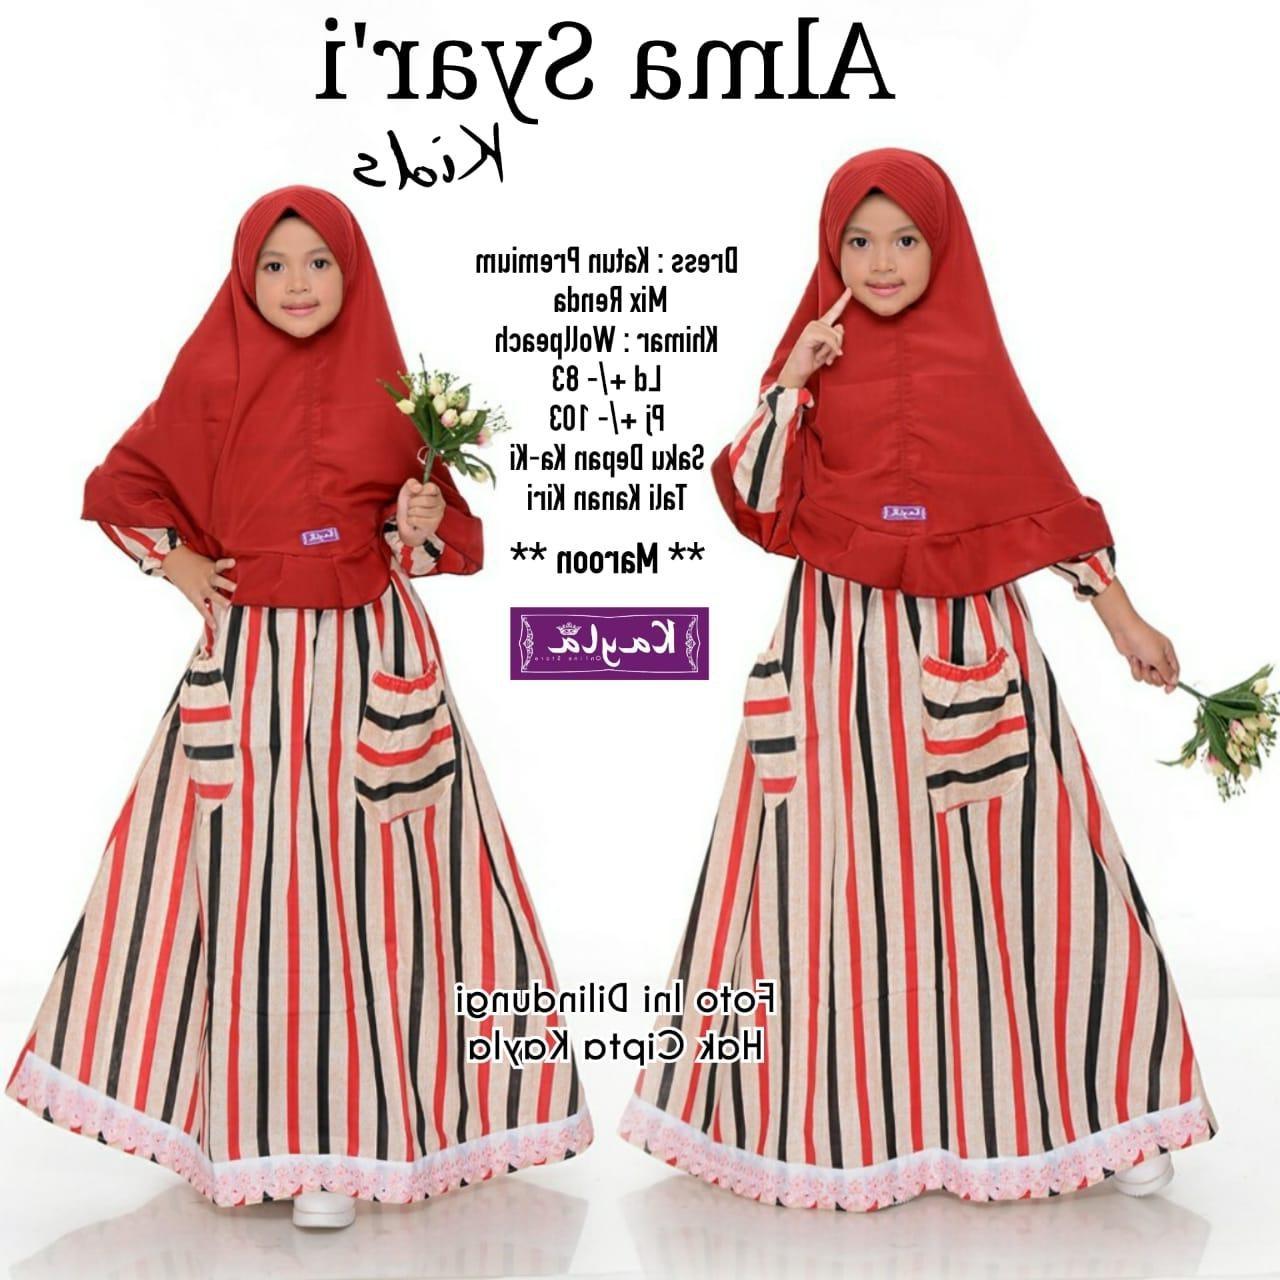 Ide Baju Lebaran Lucu Rldj Gambar Baju Lebaran Untuk Anak Perempuan